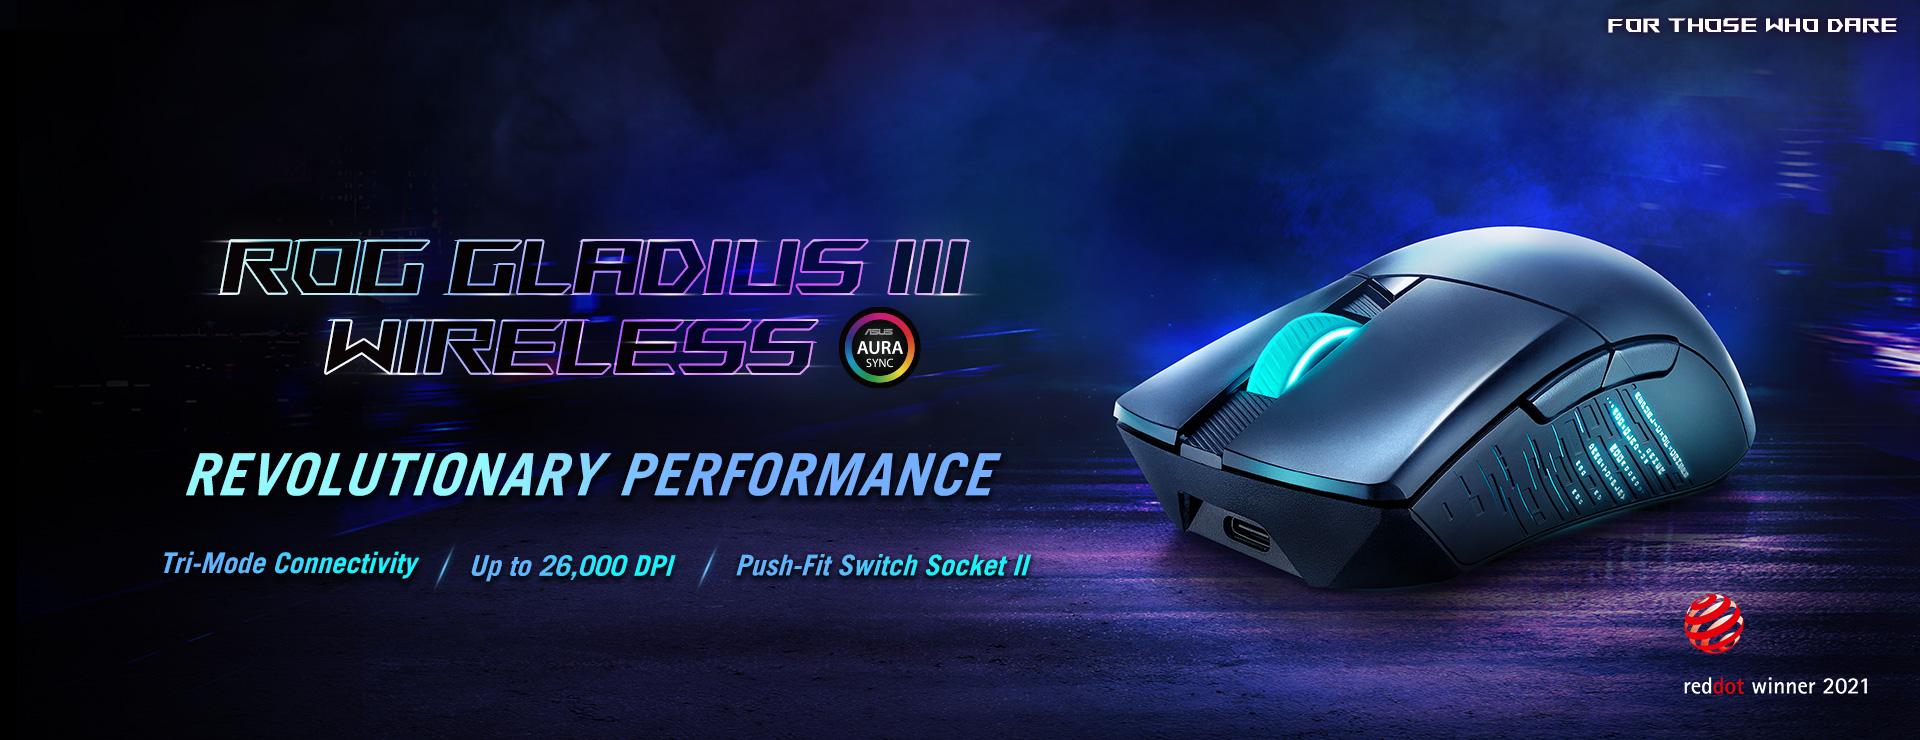 210517-0530 ROG Gladius III Wireless